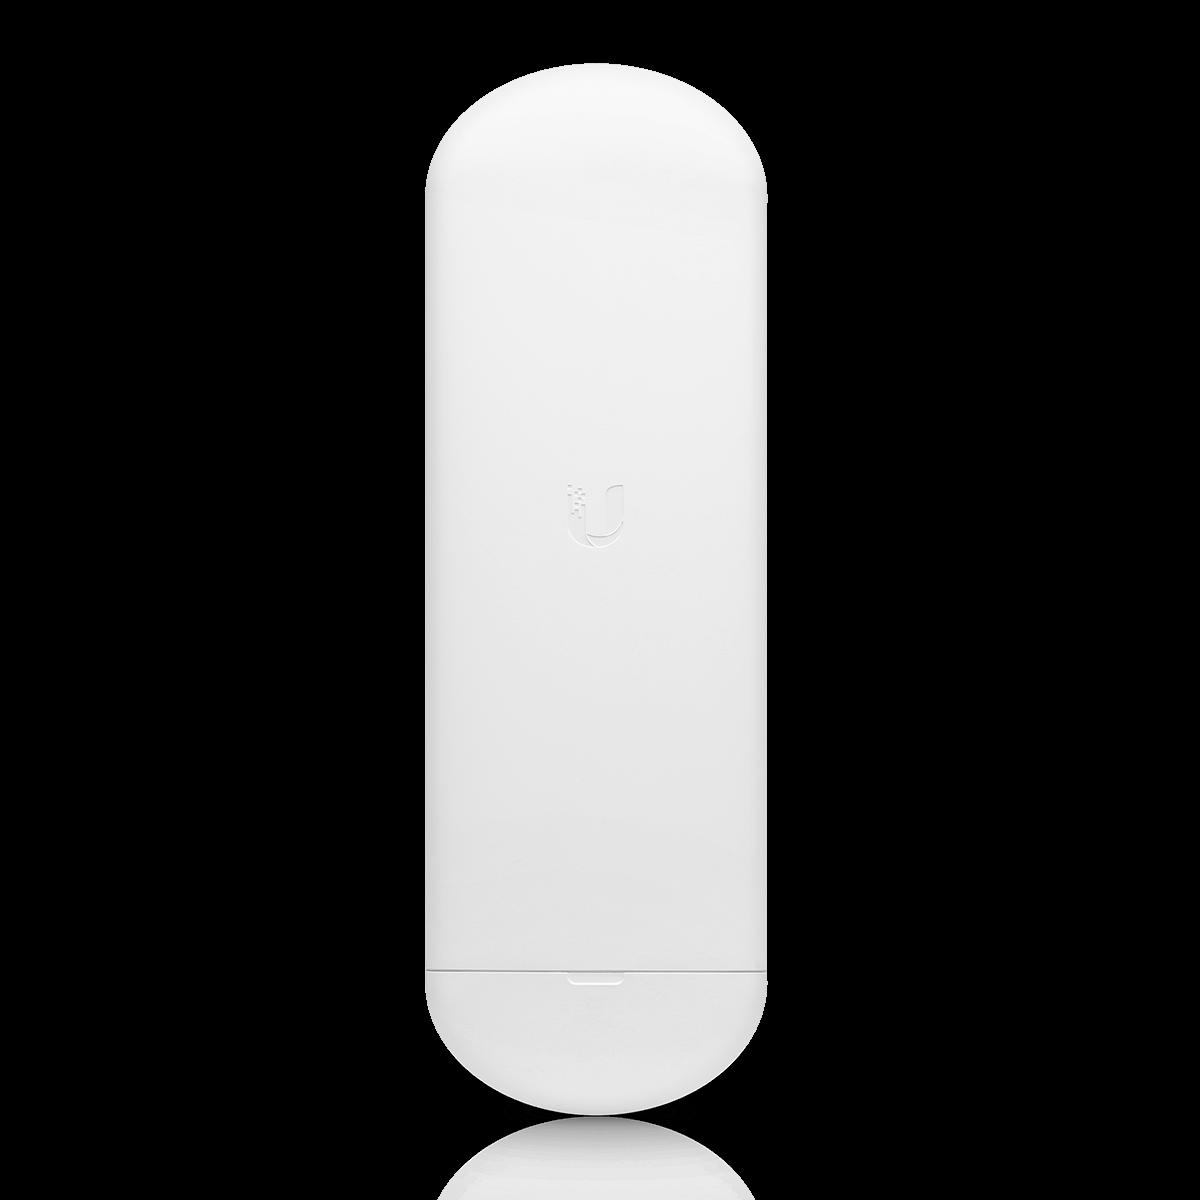 Радиомост Ubiquiti Nanostation 5 AC